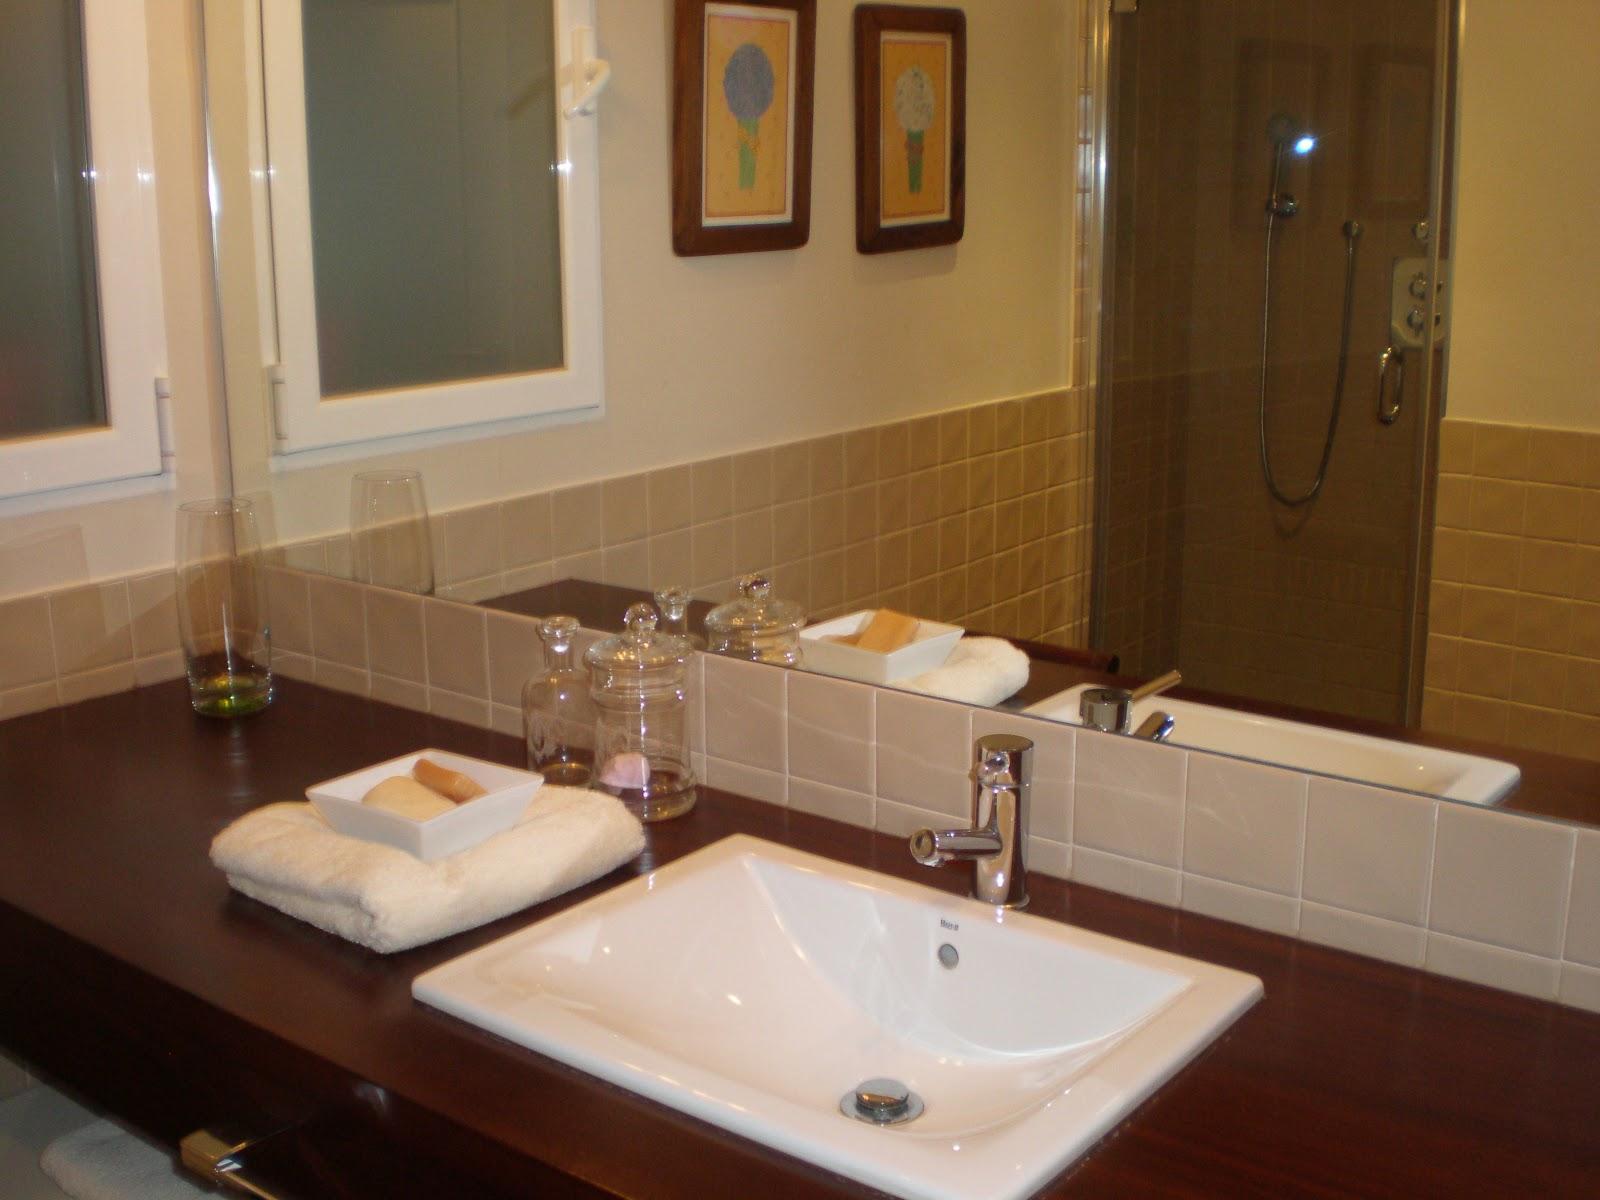 Good El Espejo Ideal Para El Baño.